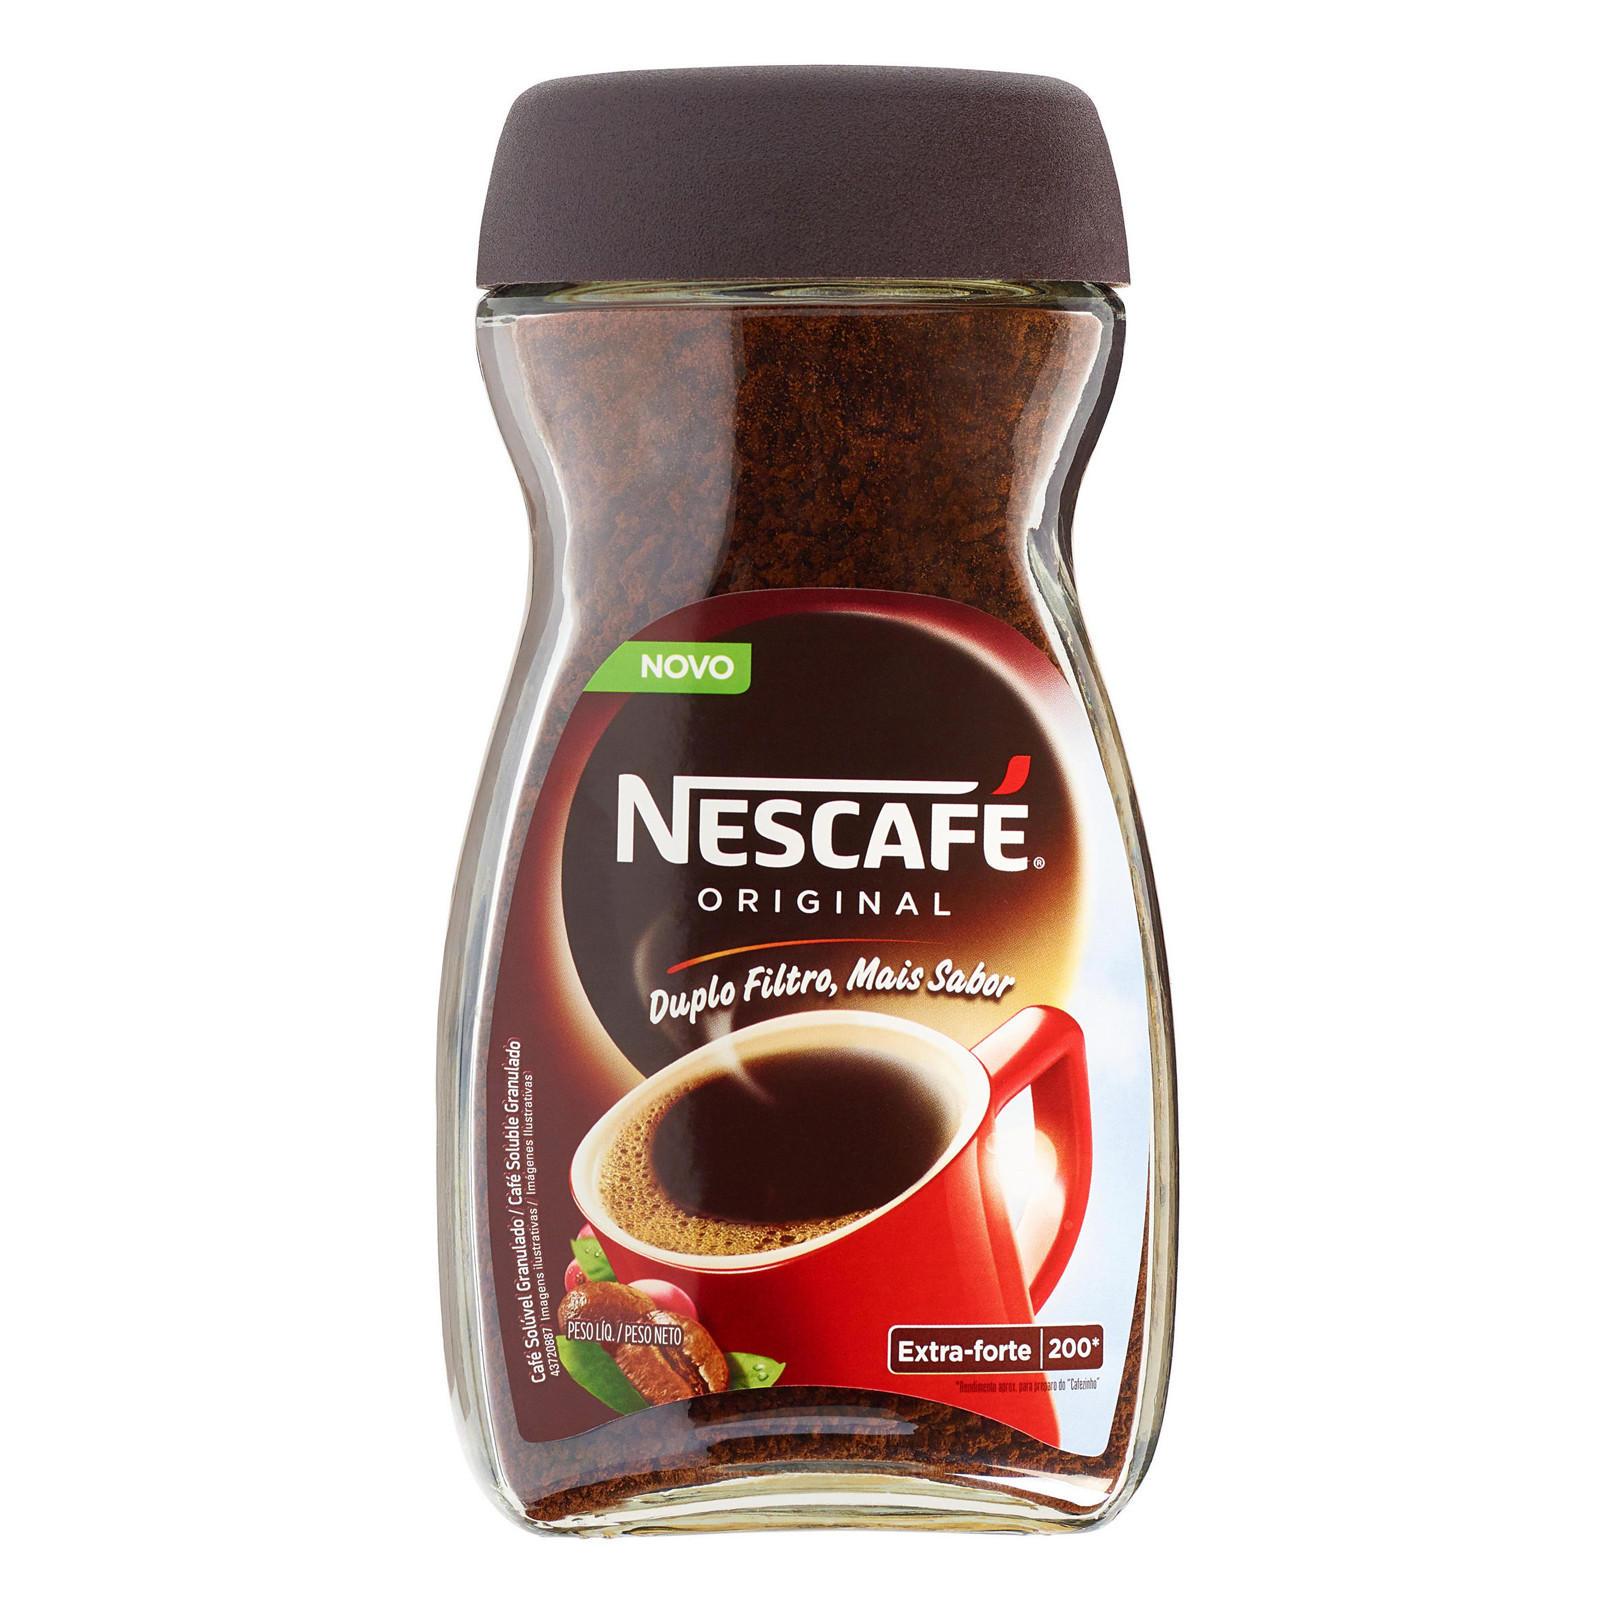 Nescafe Original Instant Coffee 200g   Hot Beverages   Iceland Foods